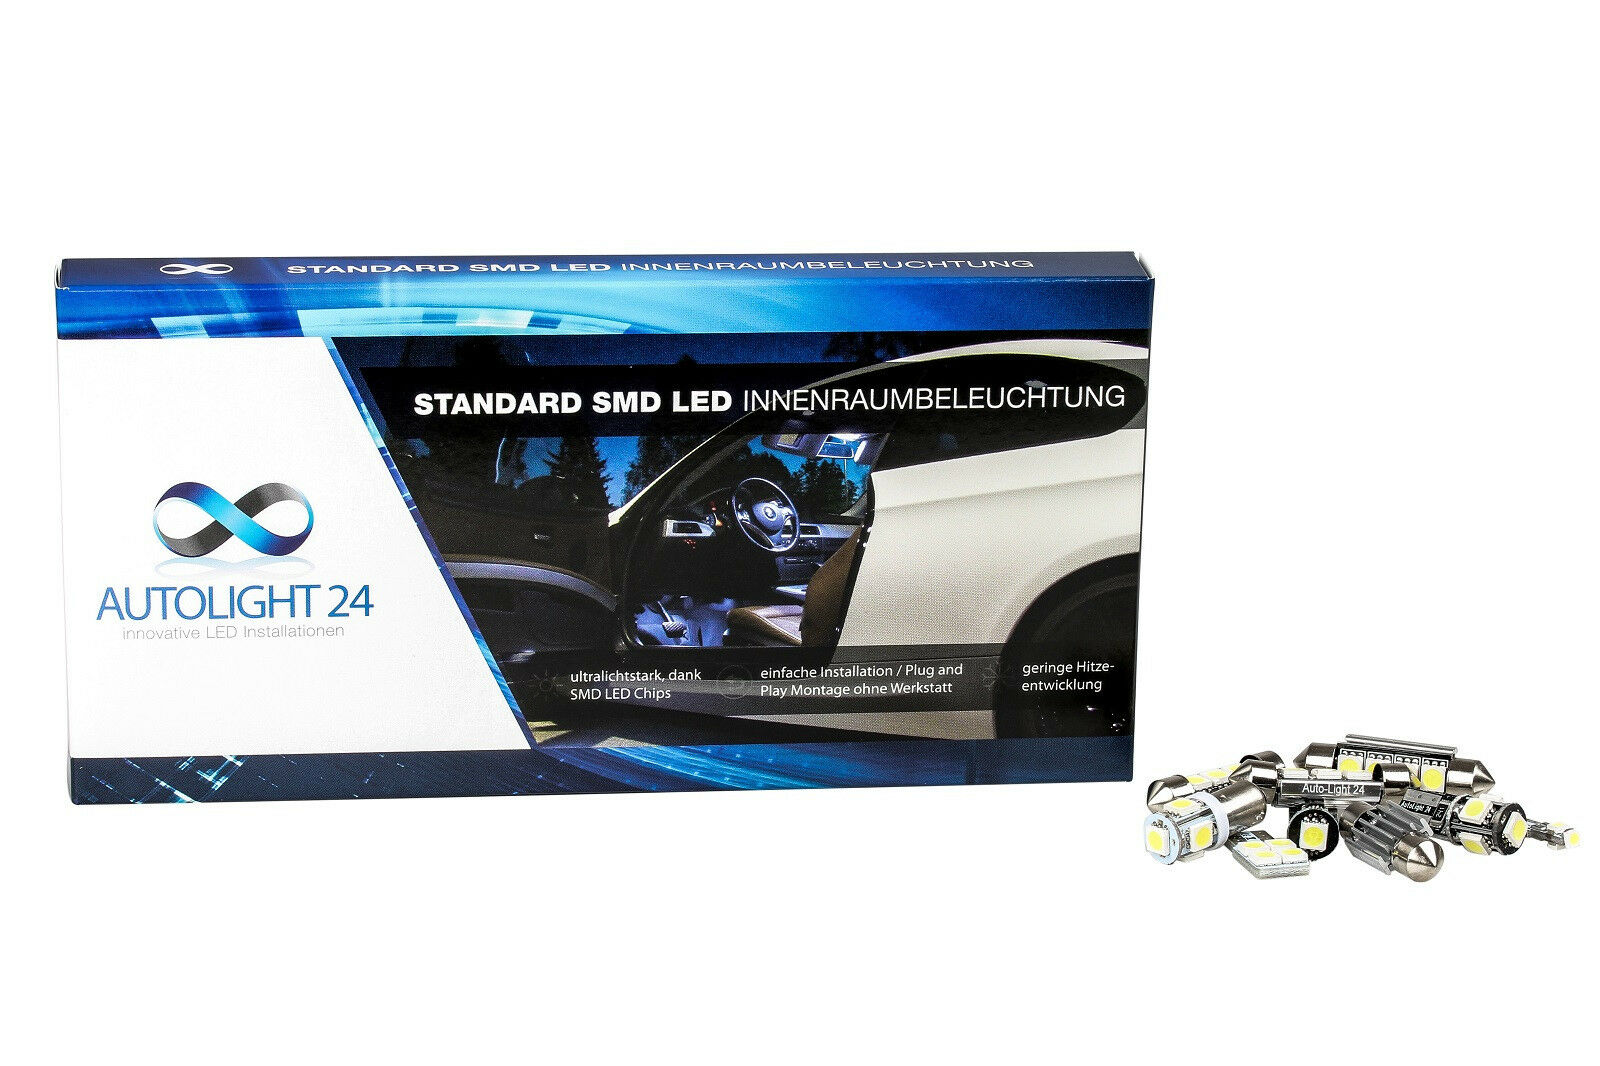 Standard LED SMD Interior Light for RENAULT TWINGO 3 | eBay